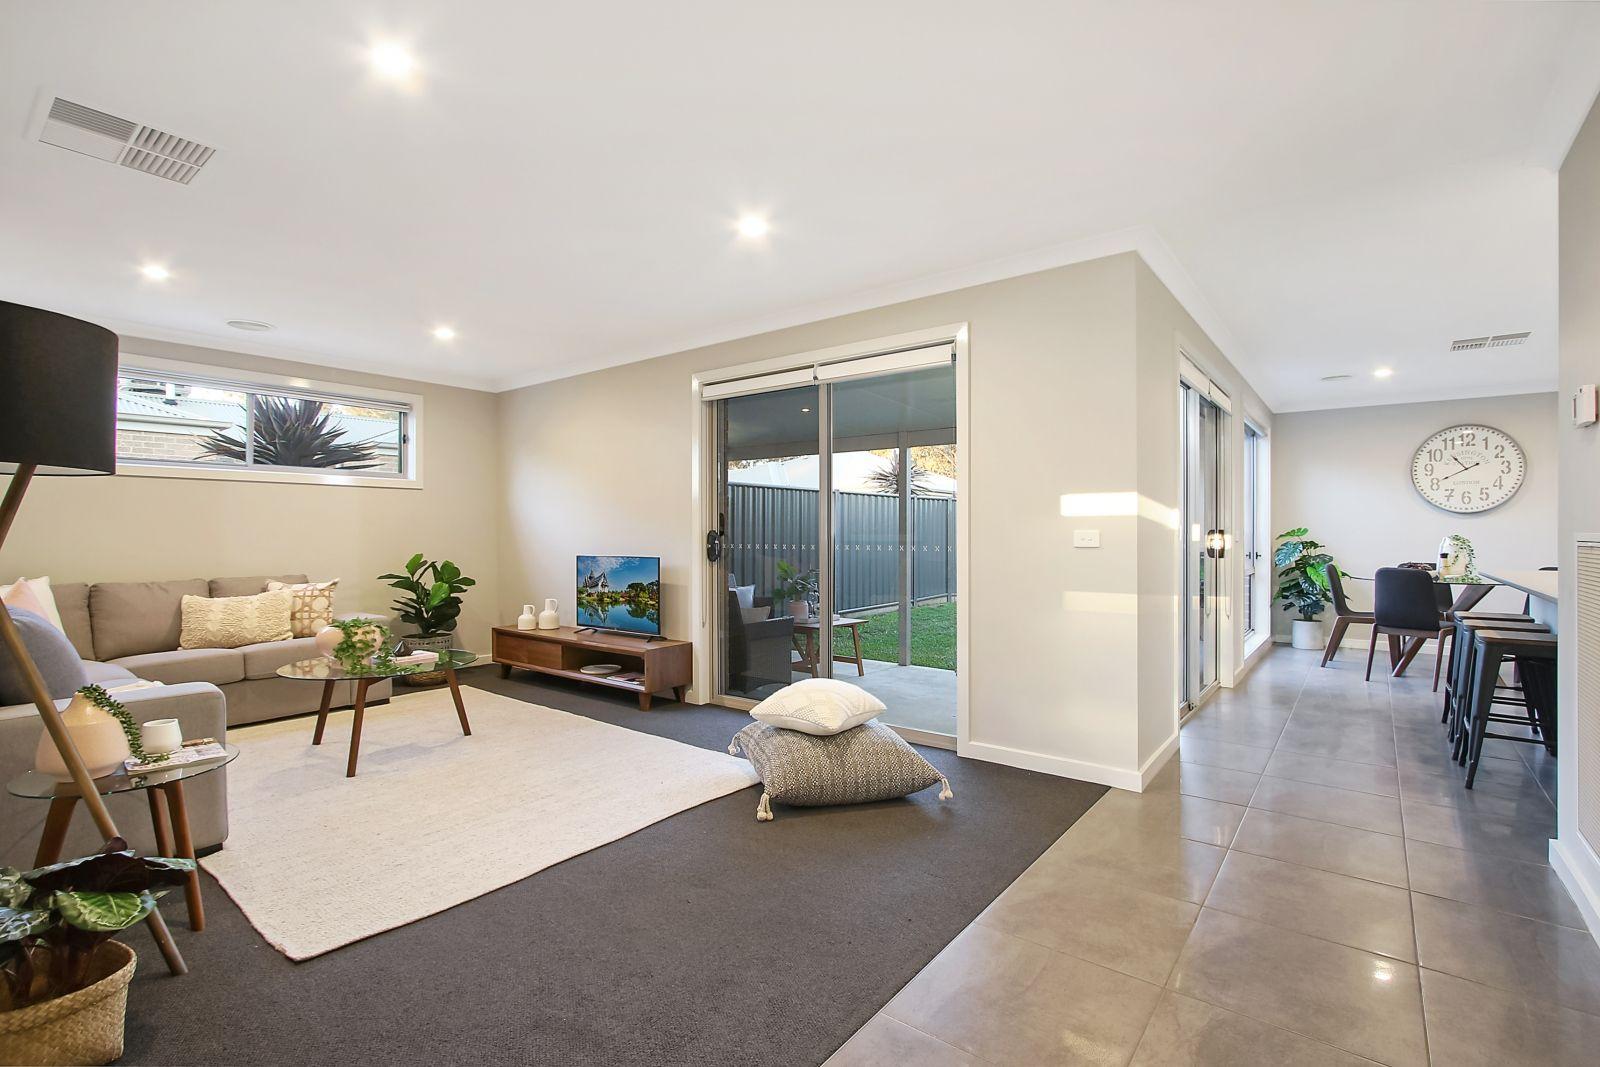 1/42 Hotham Circuit, Thurgoona NSW 2640, Image 0